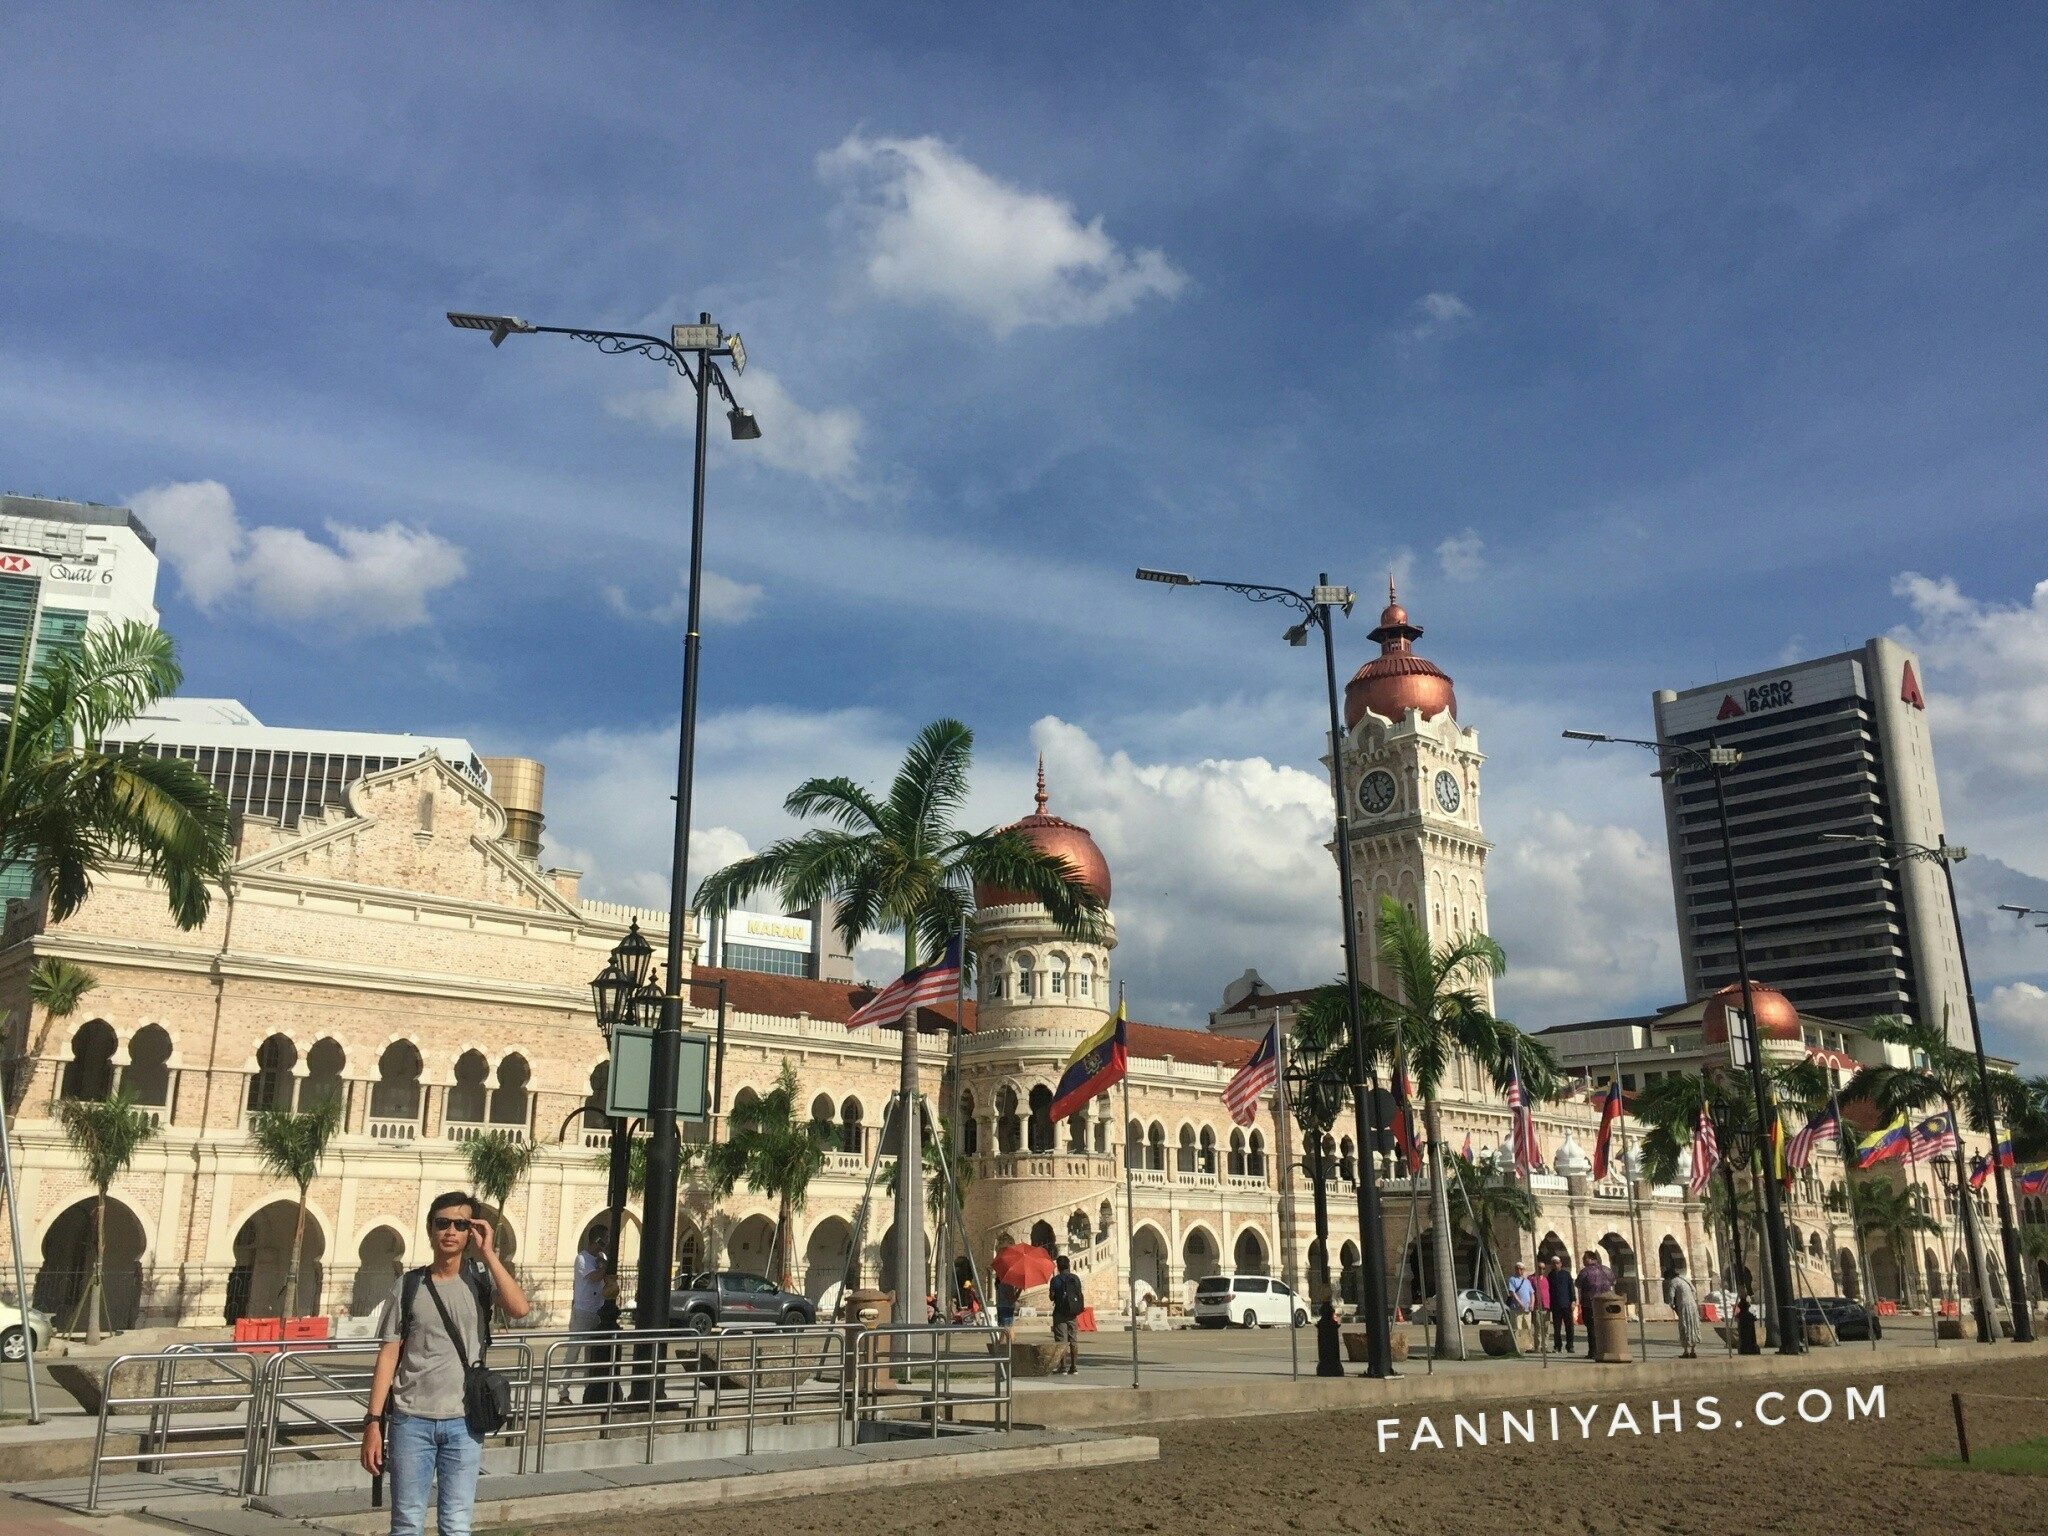 Tempat Wisata Di Kuala Lumpur Tempat Wisata Di Malaysia